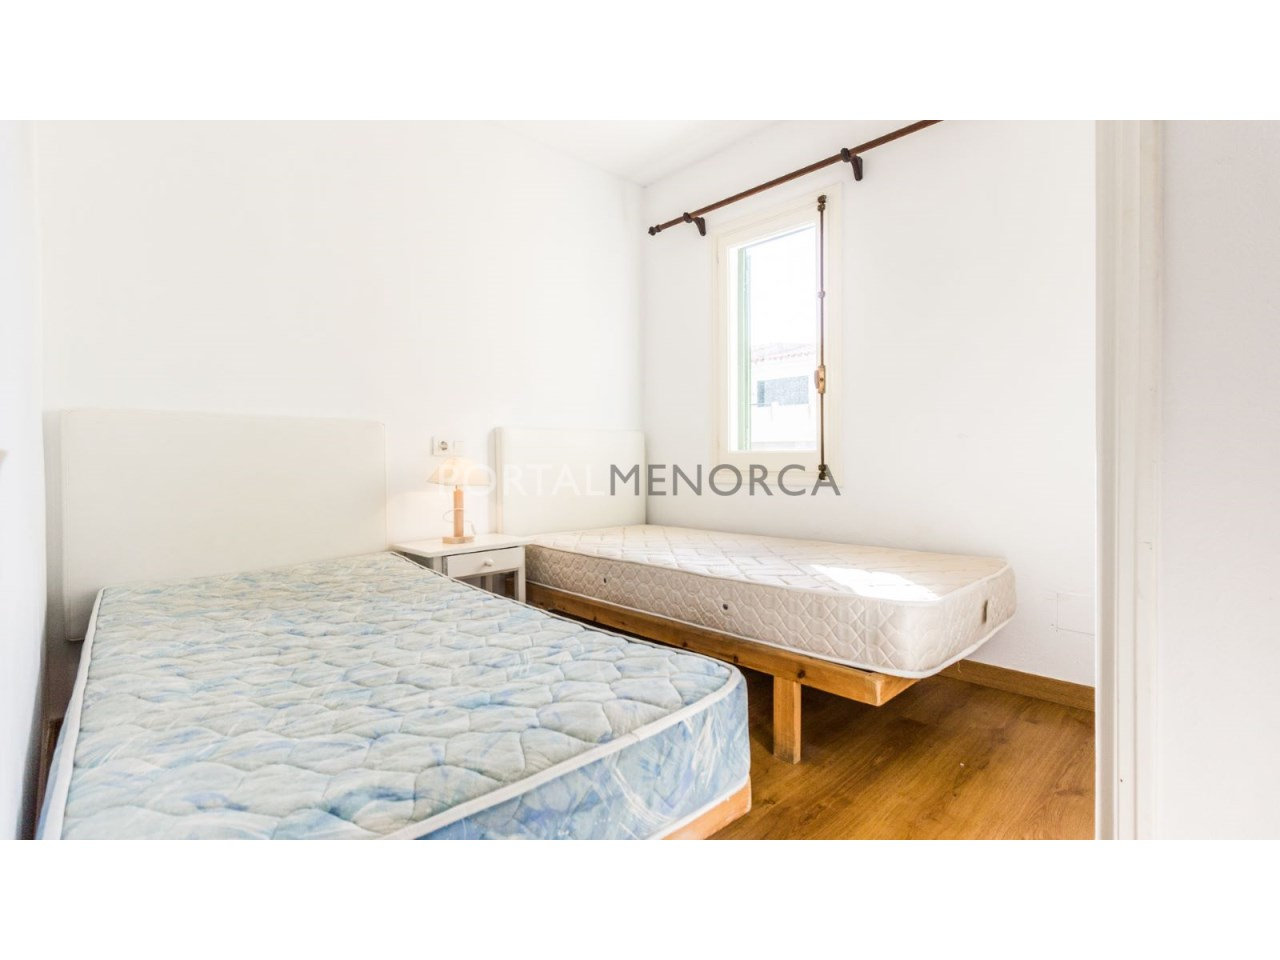 apartamento en venta en Arenal d'en Castell (4 de 14)